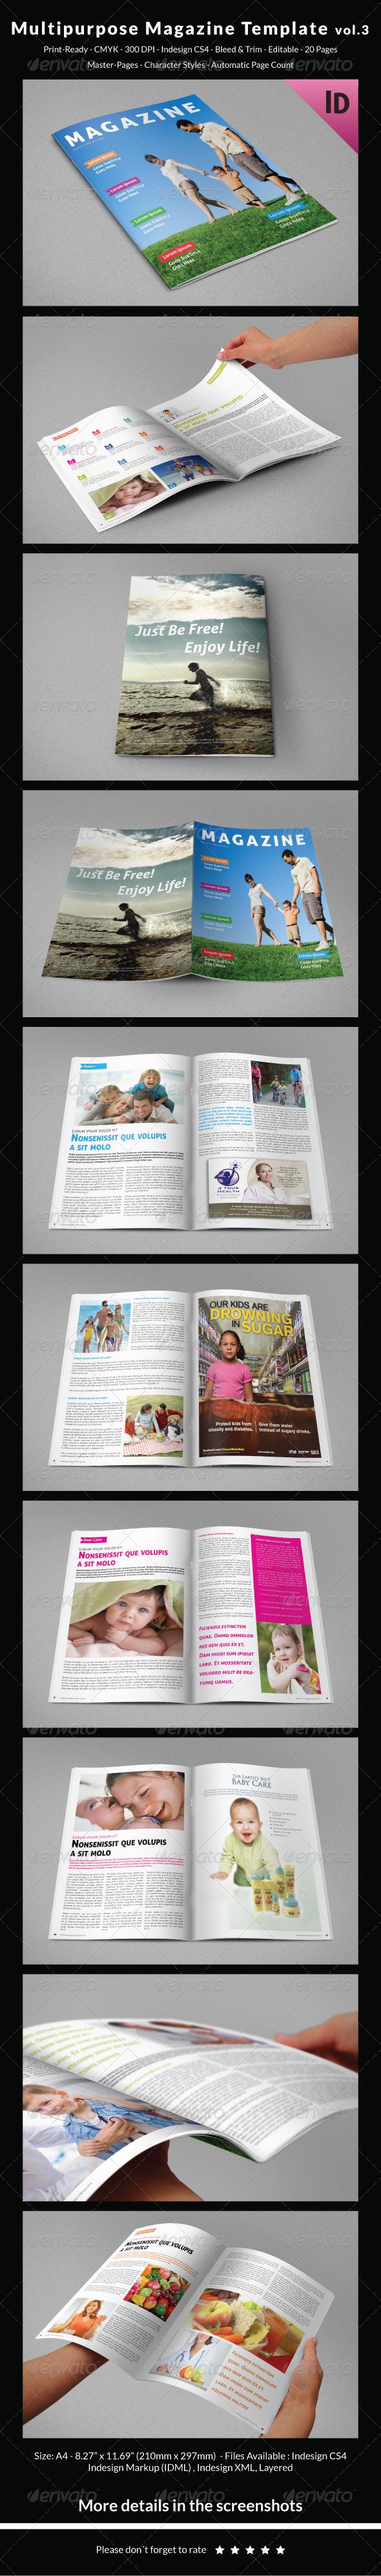 Multipurpose Magazine Template Vol.3 - Magazines Print Templates